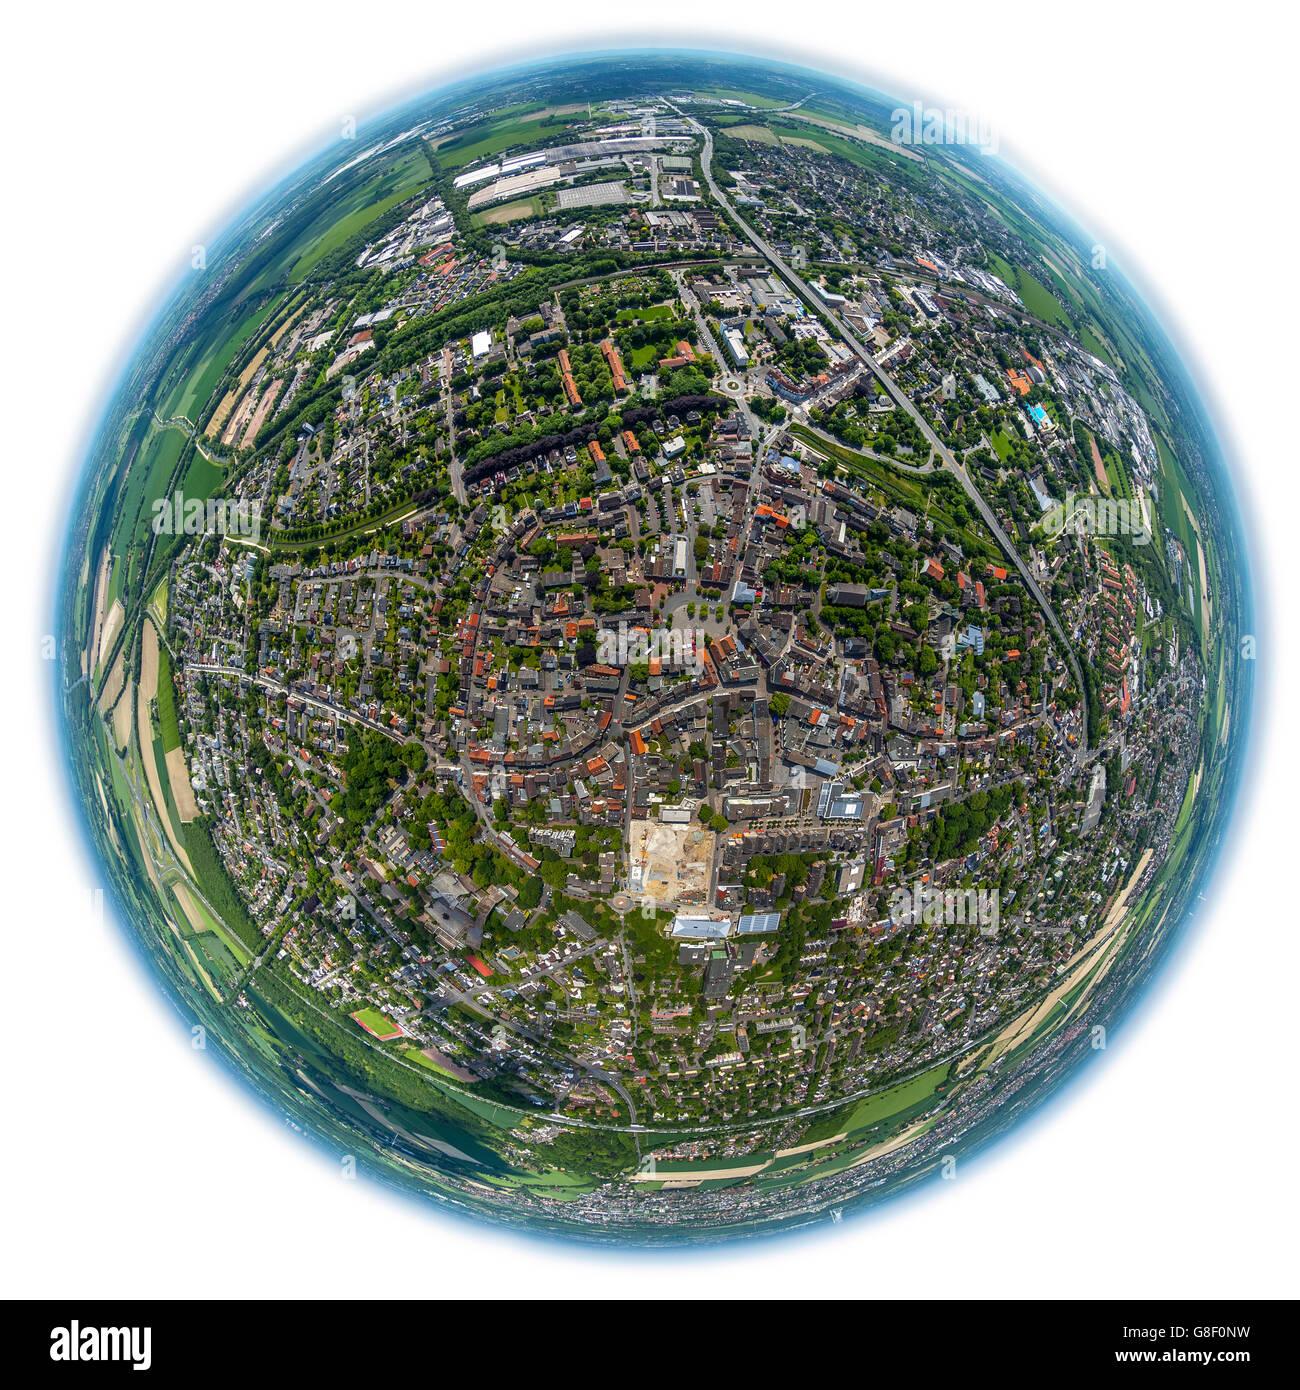 Aerial view, fisheye optics, fisheye lens, overview of Kamen, Kamen, Ruhr area, North Rhine Westphalia, Germany, - Stock Image